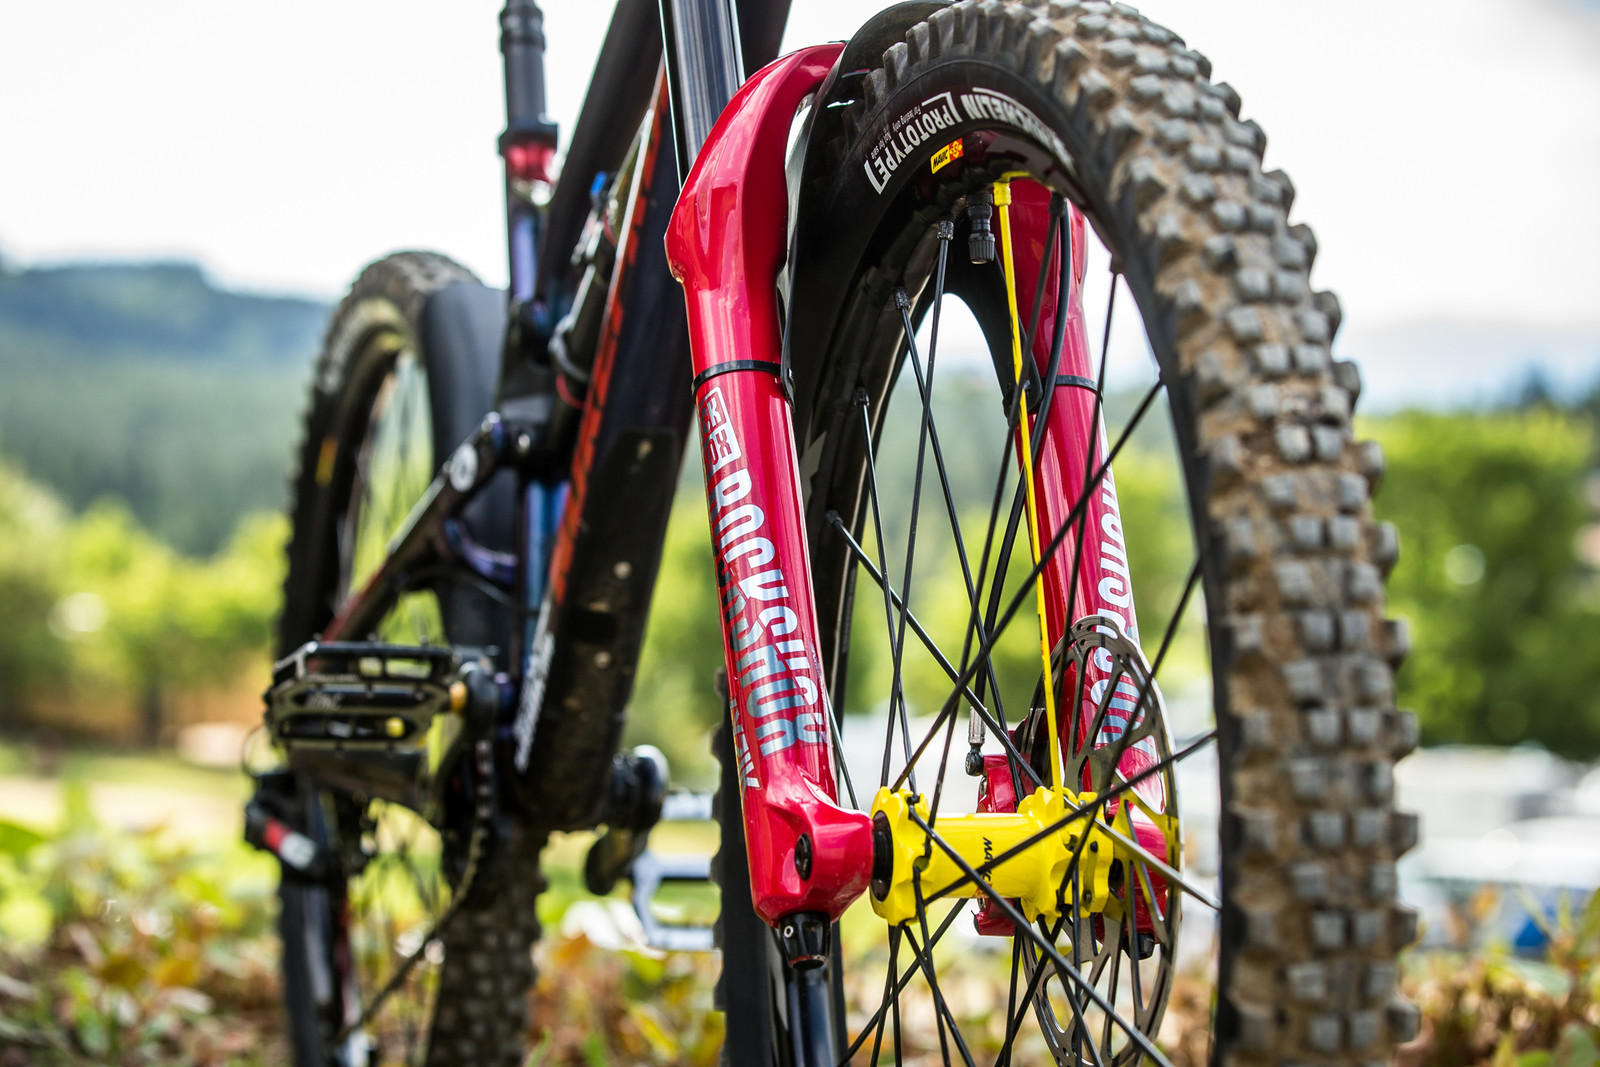 RockShox Lyrik - WINNING BIKE - Sam Hill's Nukeproof Mega 275 - Mountain Biking Pictures - Vital MTB